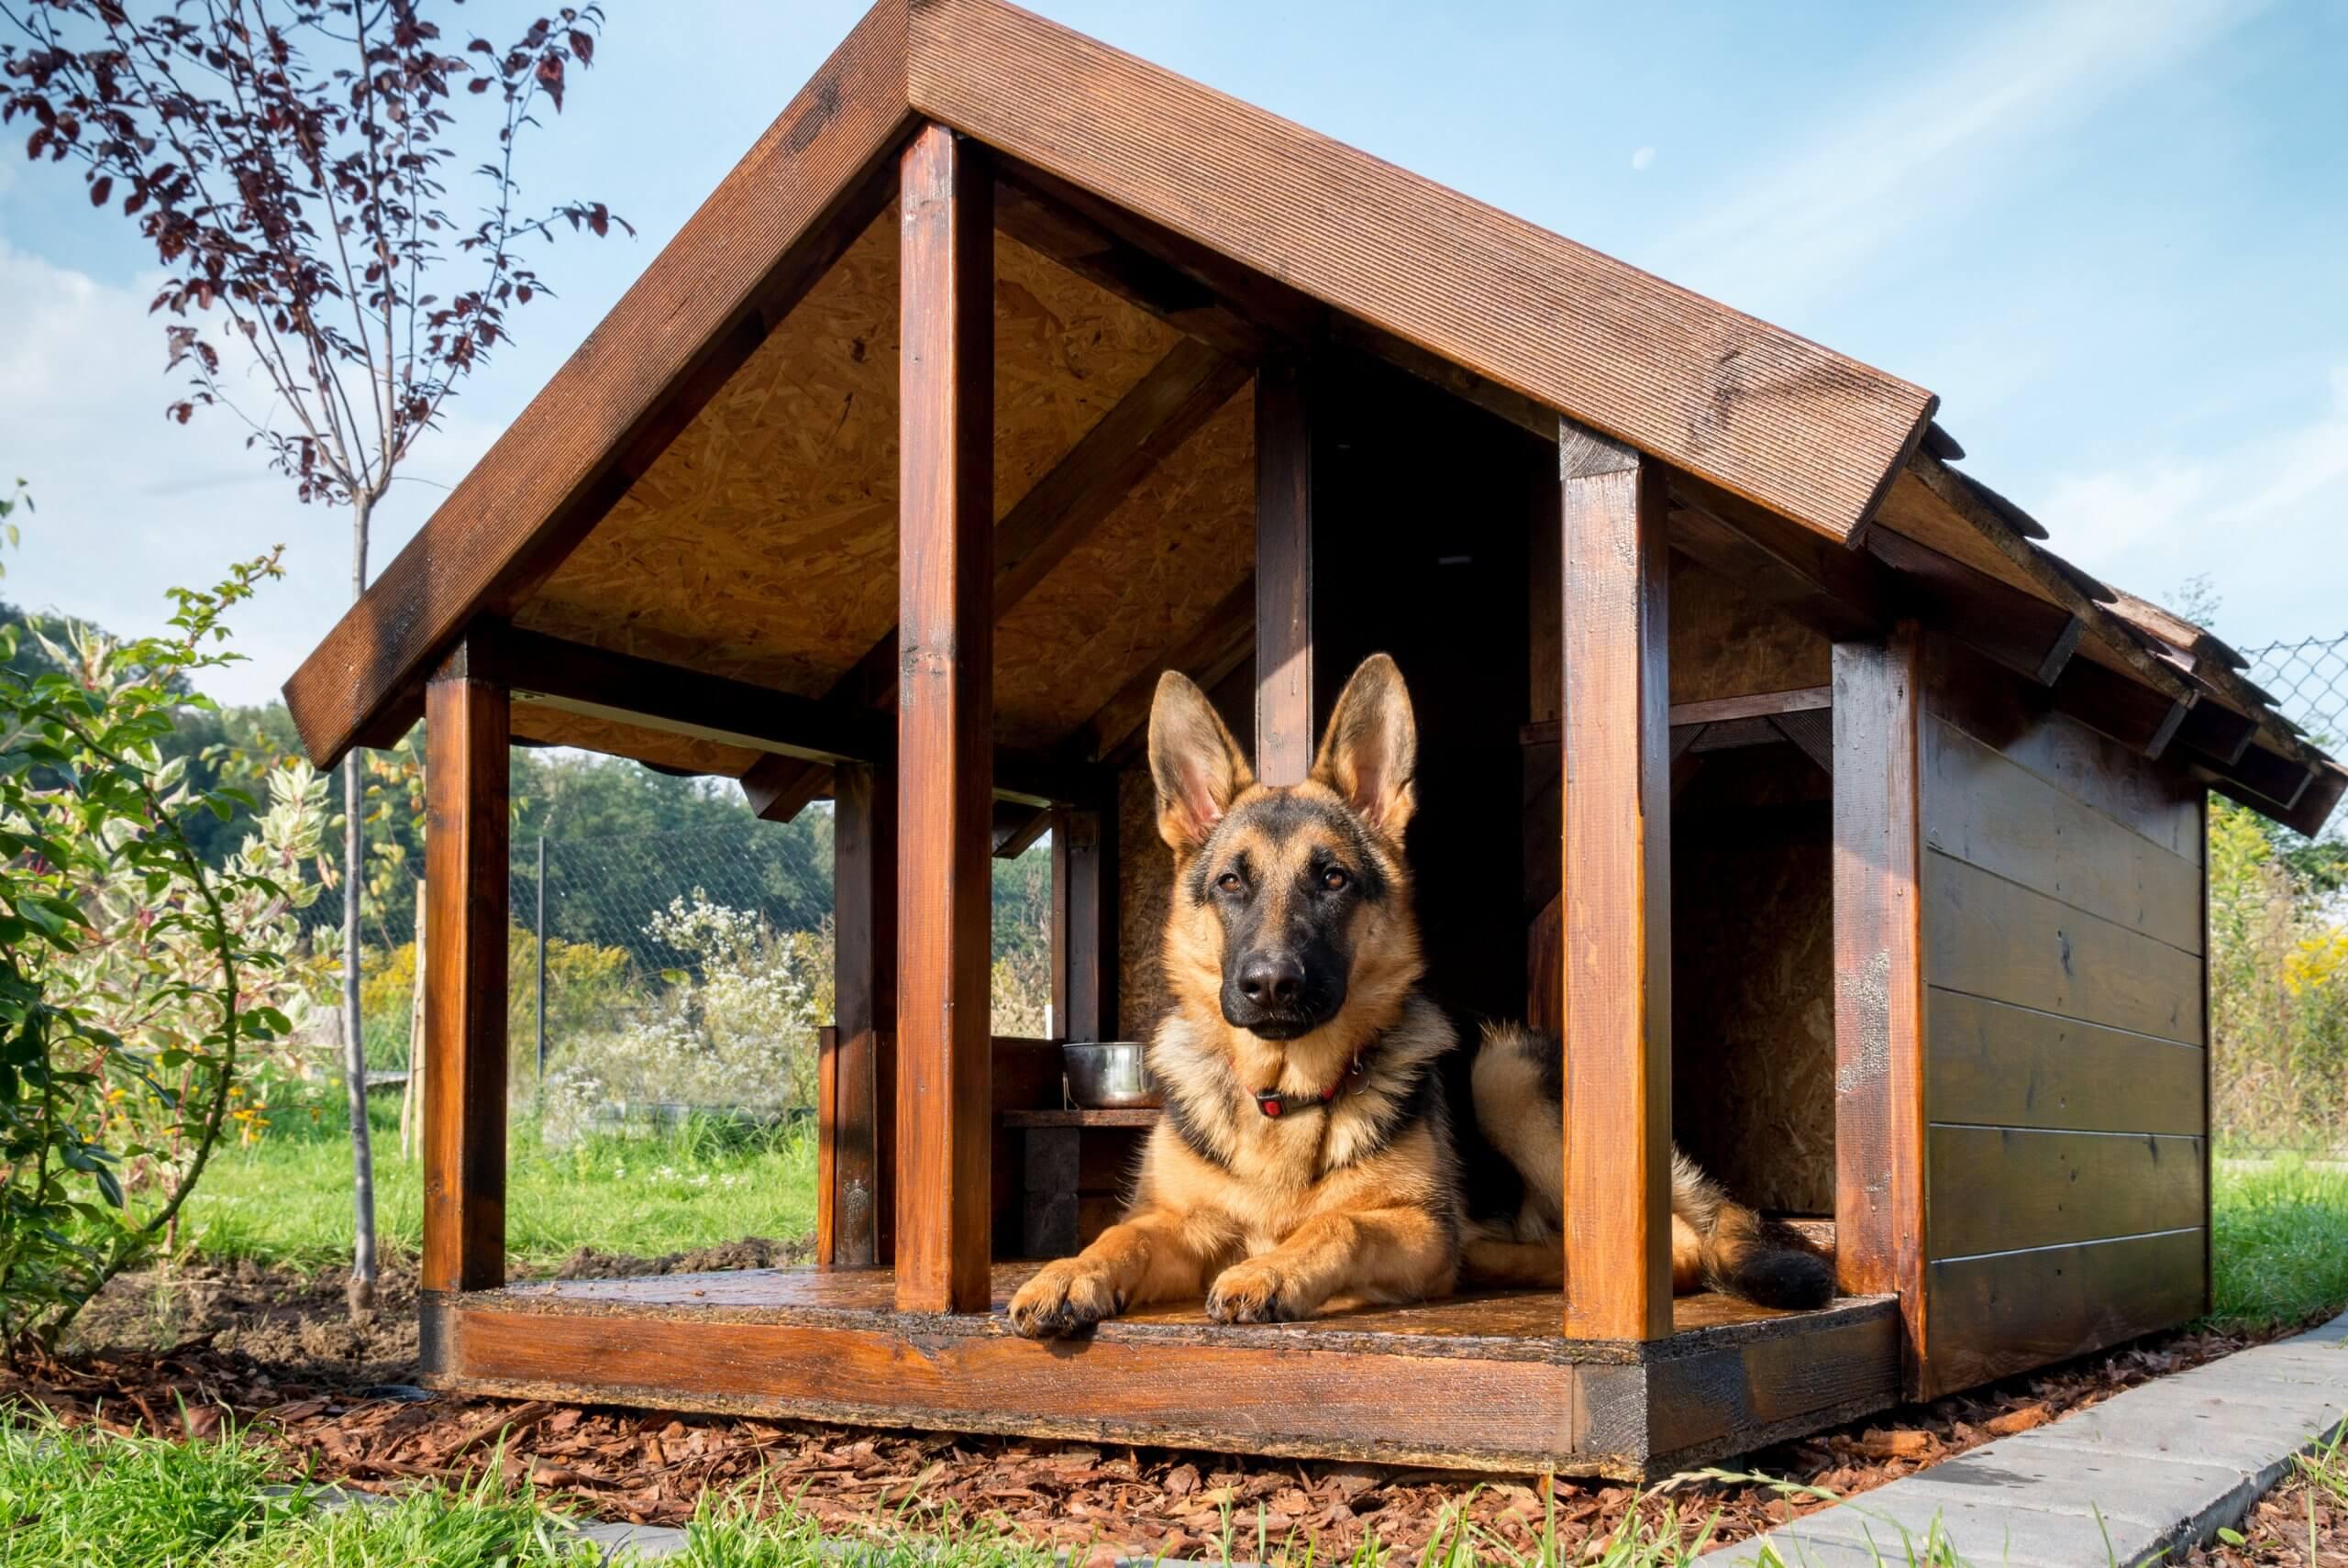 german shepherd dog resting in wooden kennel outdoors